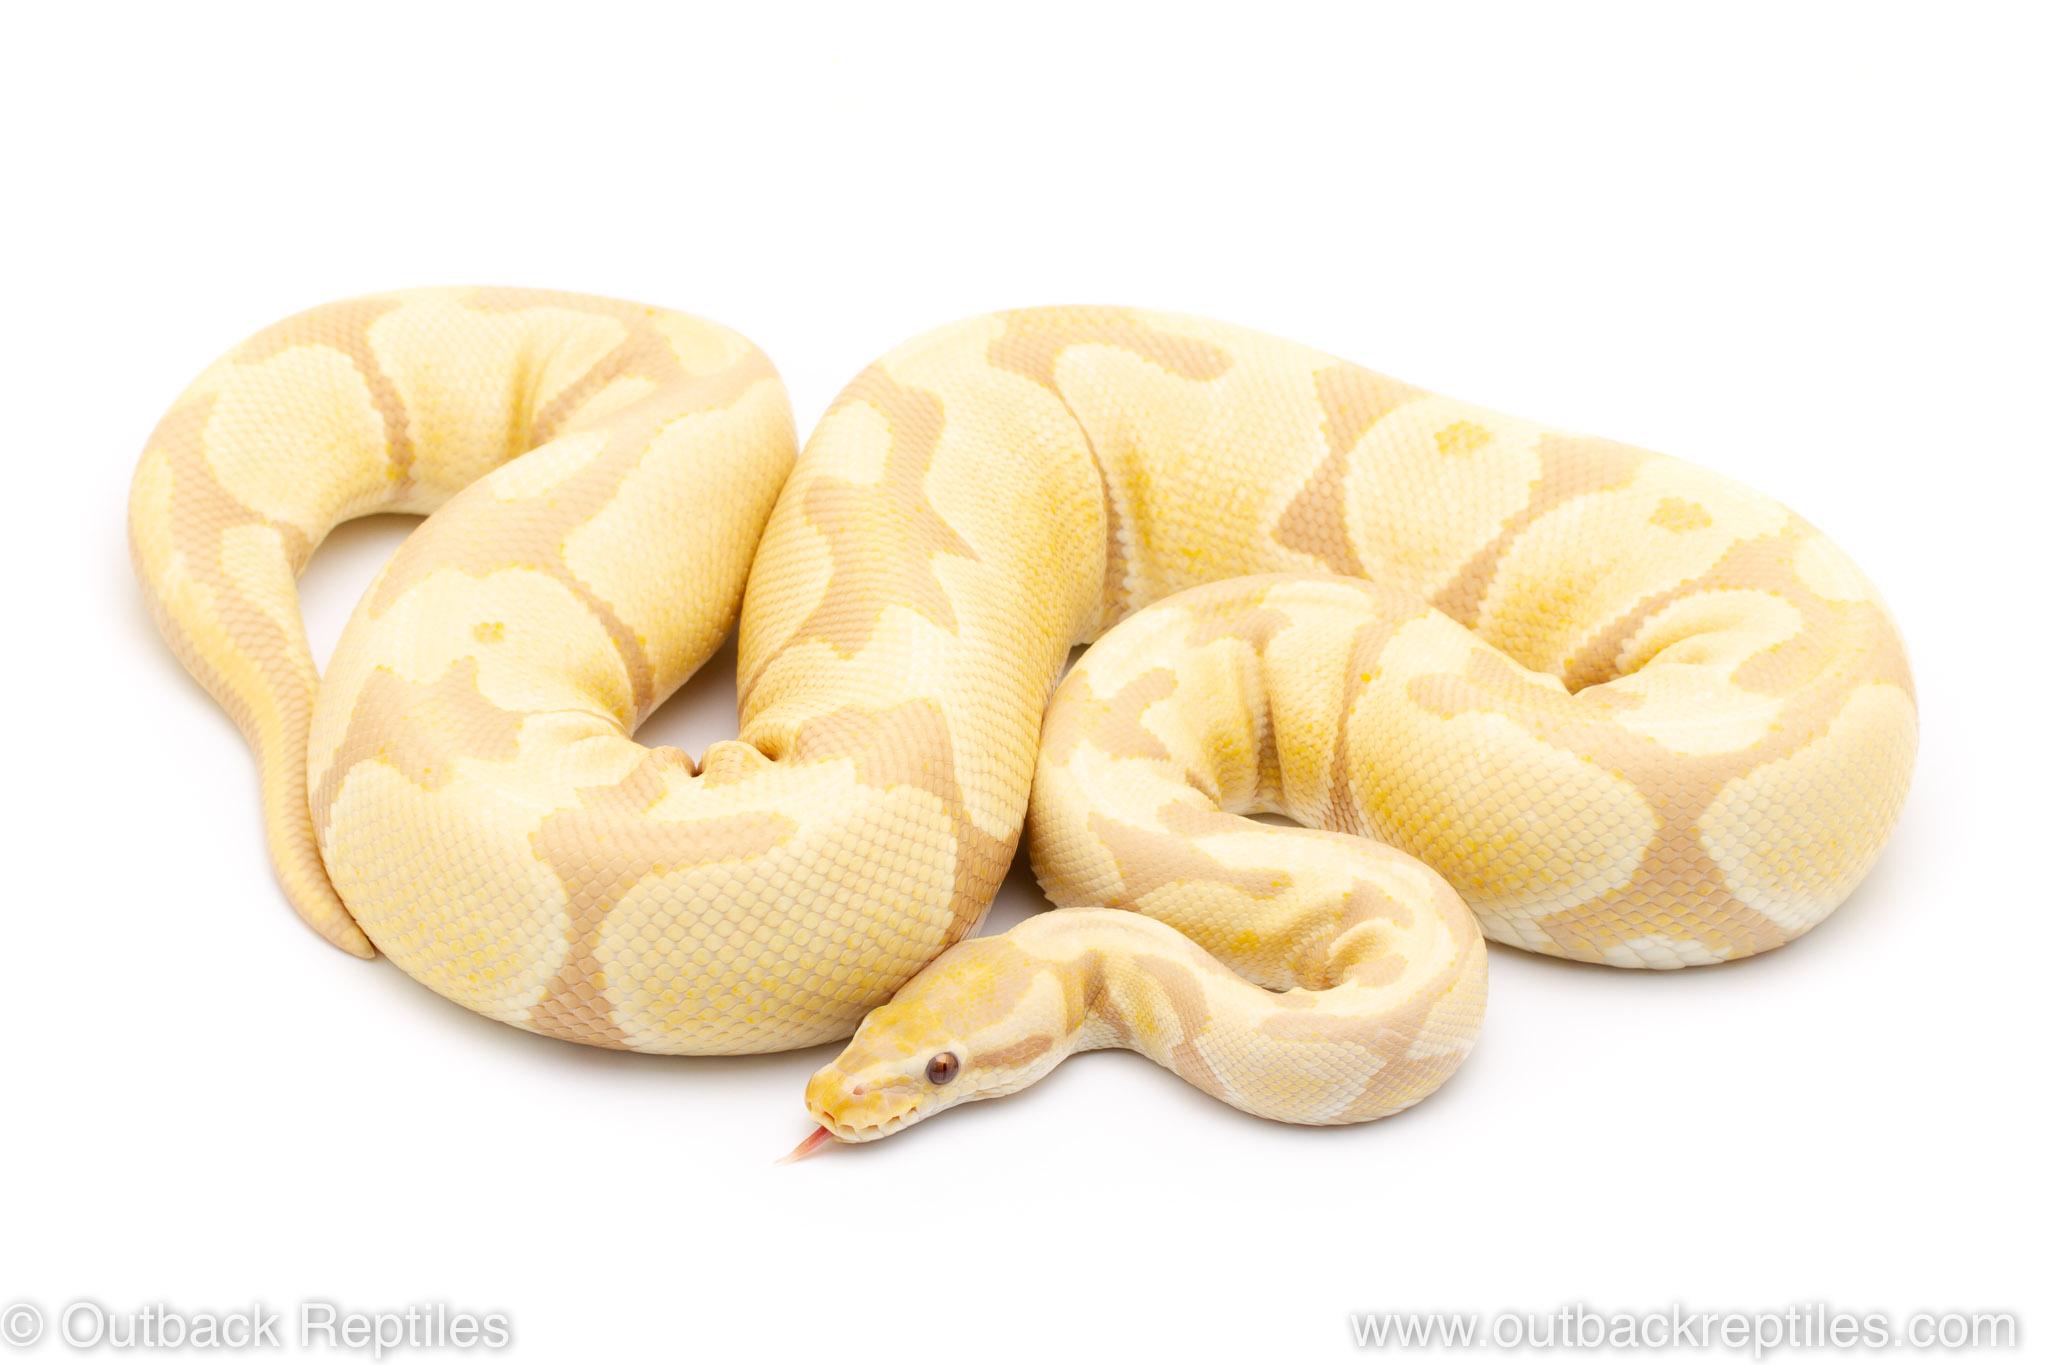 Toffino ball python for sale